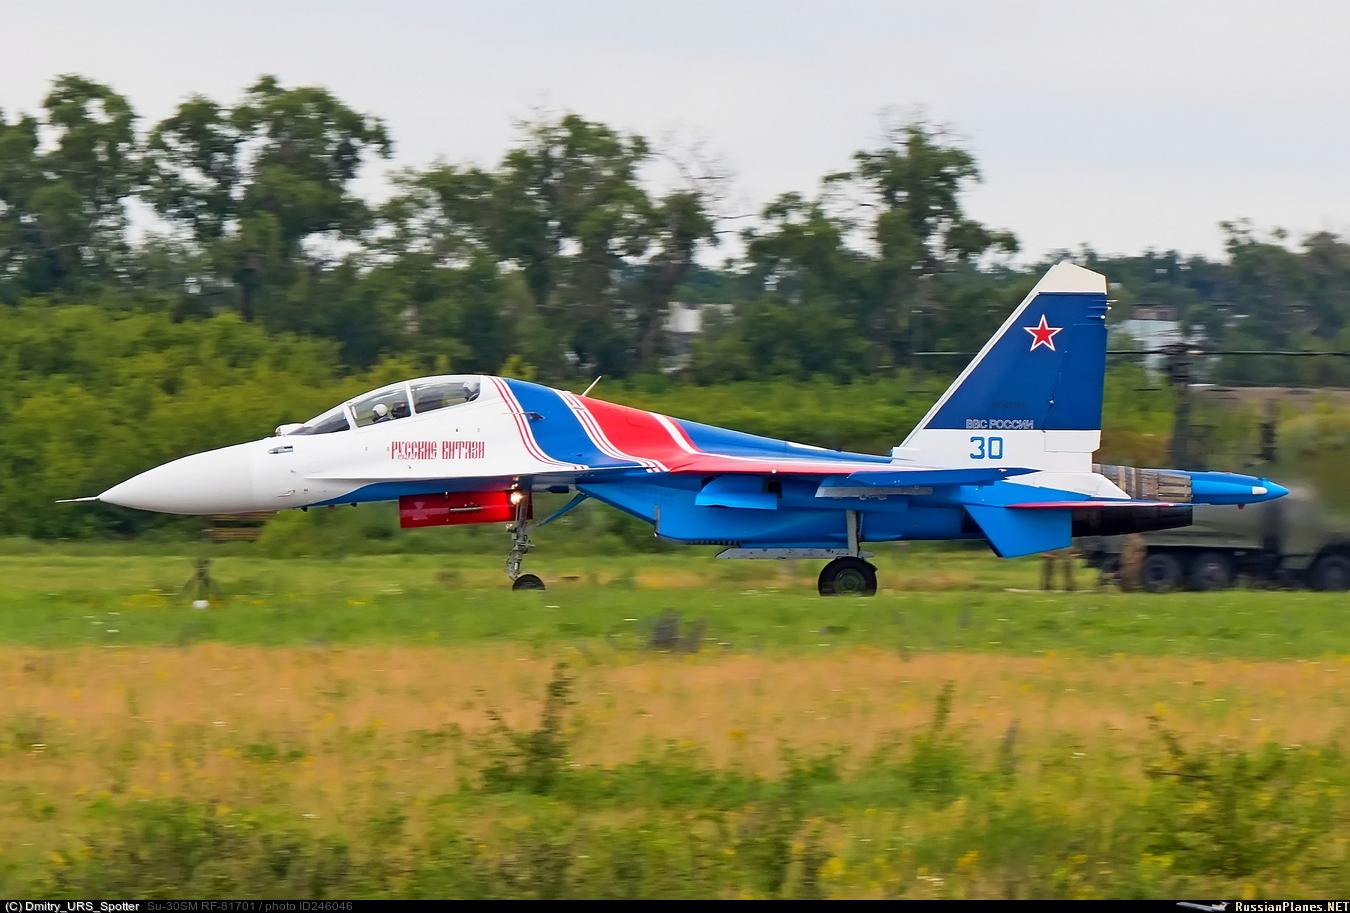 https://russianplanes.net/images/to247000/246046.jpg